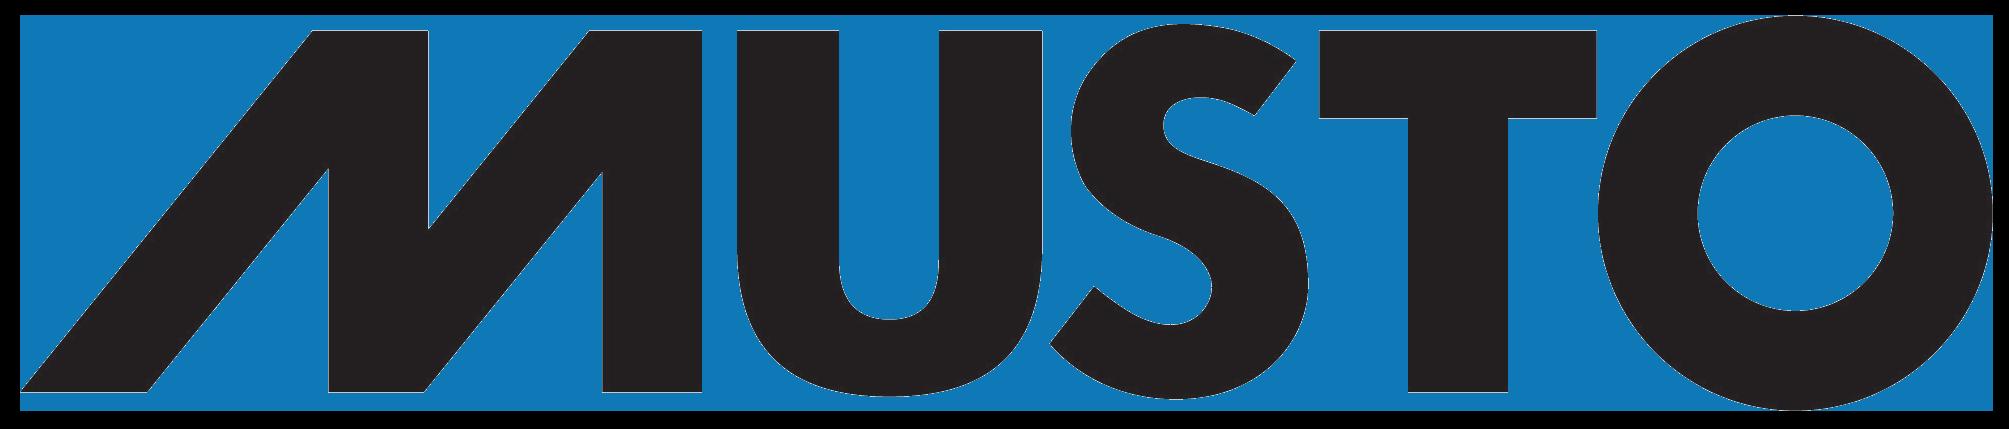 Musto logo image